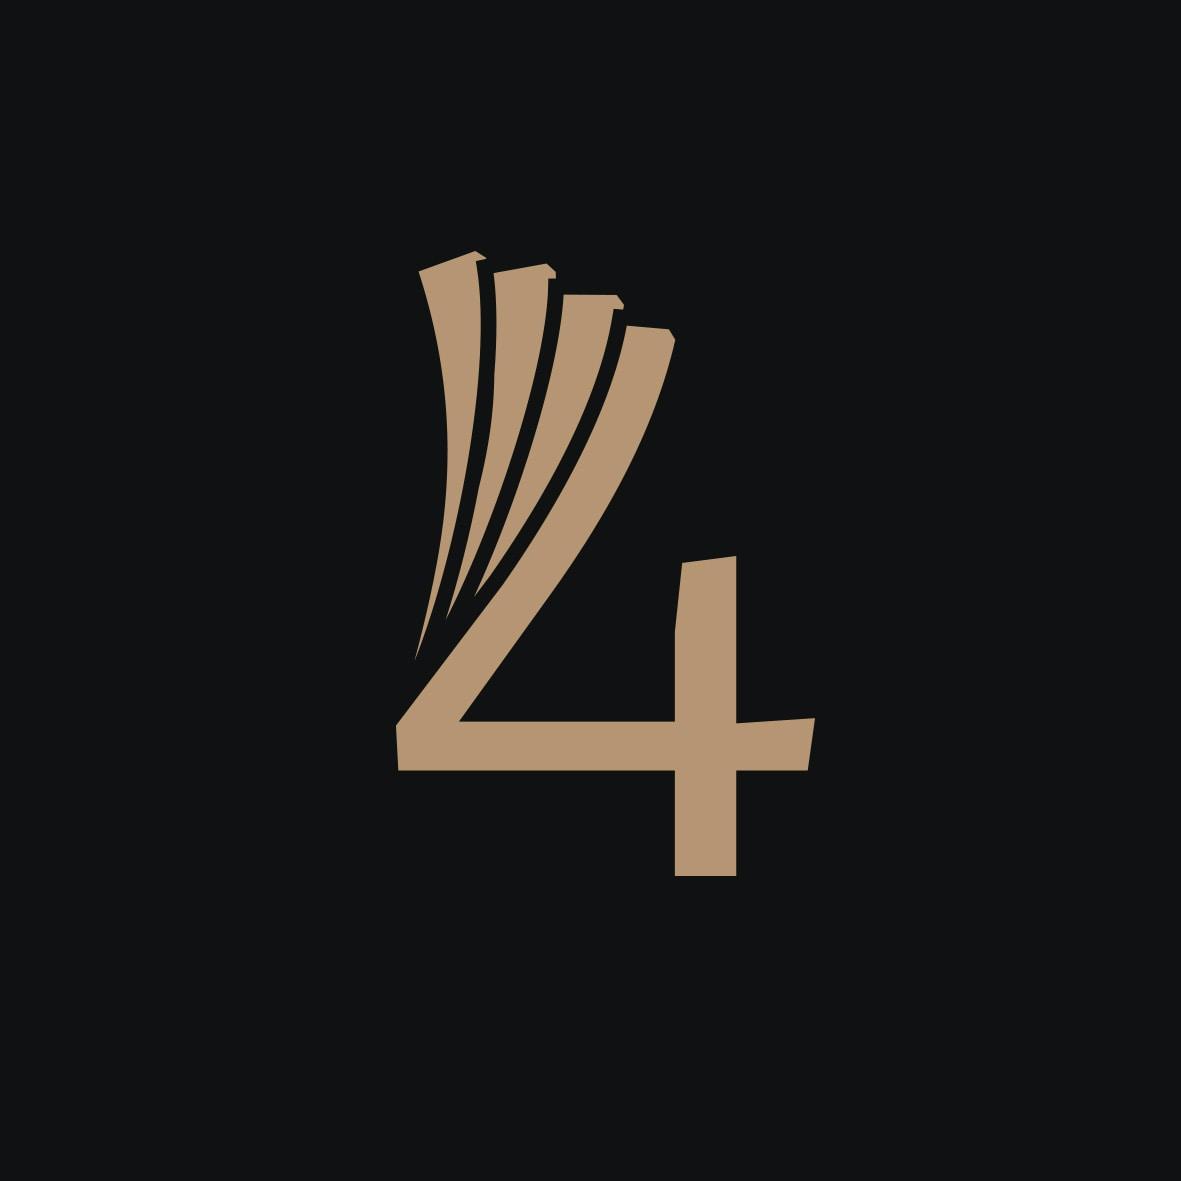 Go to 4motions Werbeagentur's profile